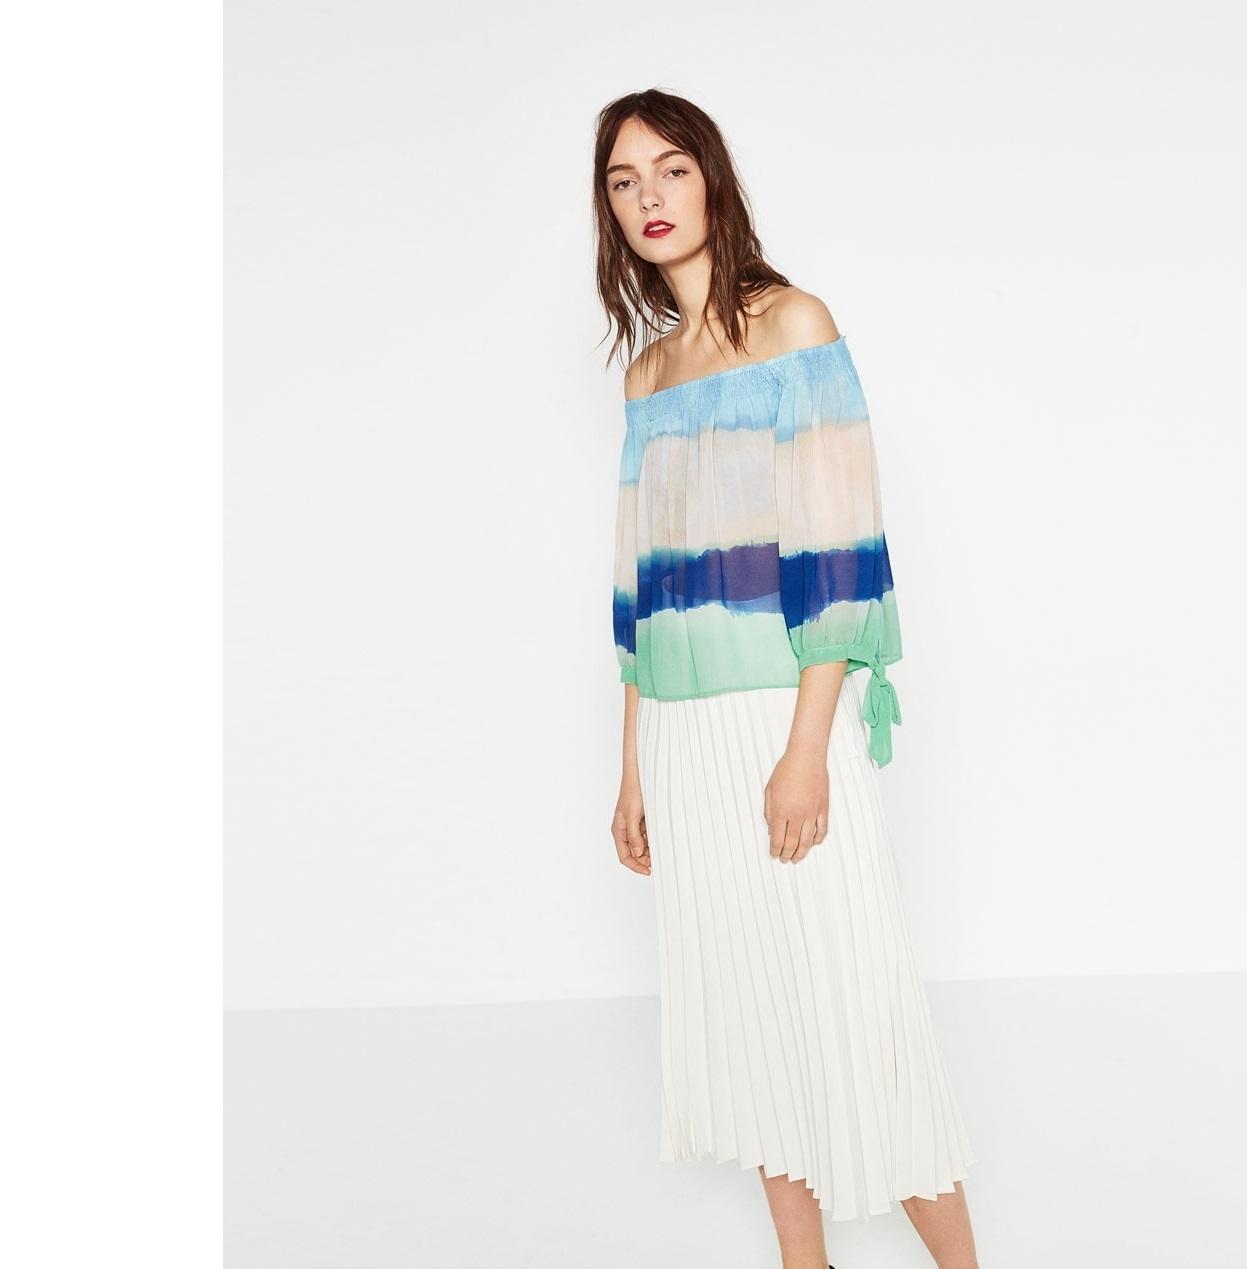 Zara Blouse Australia 62